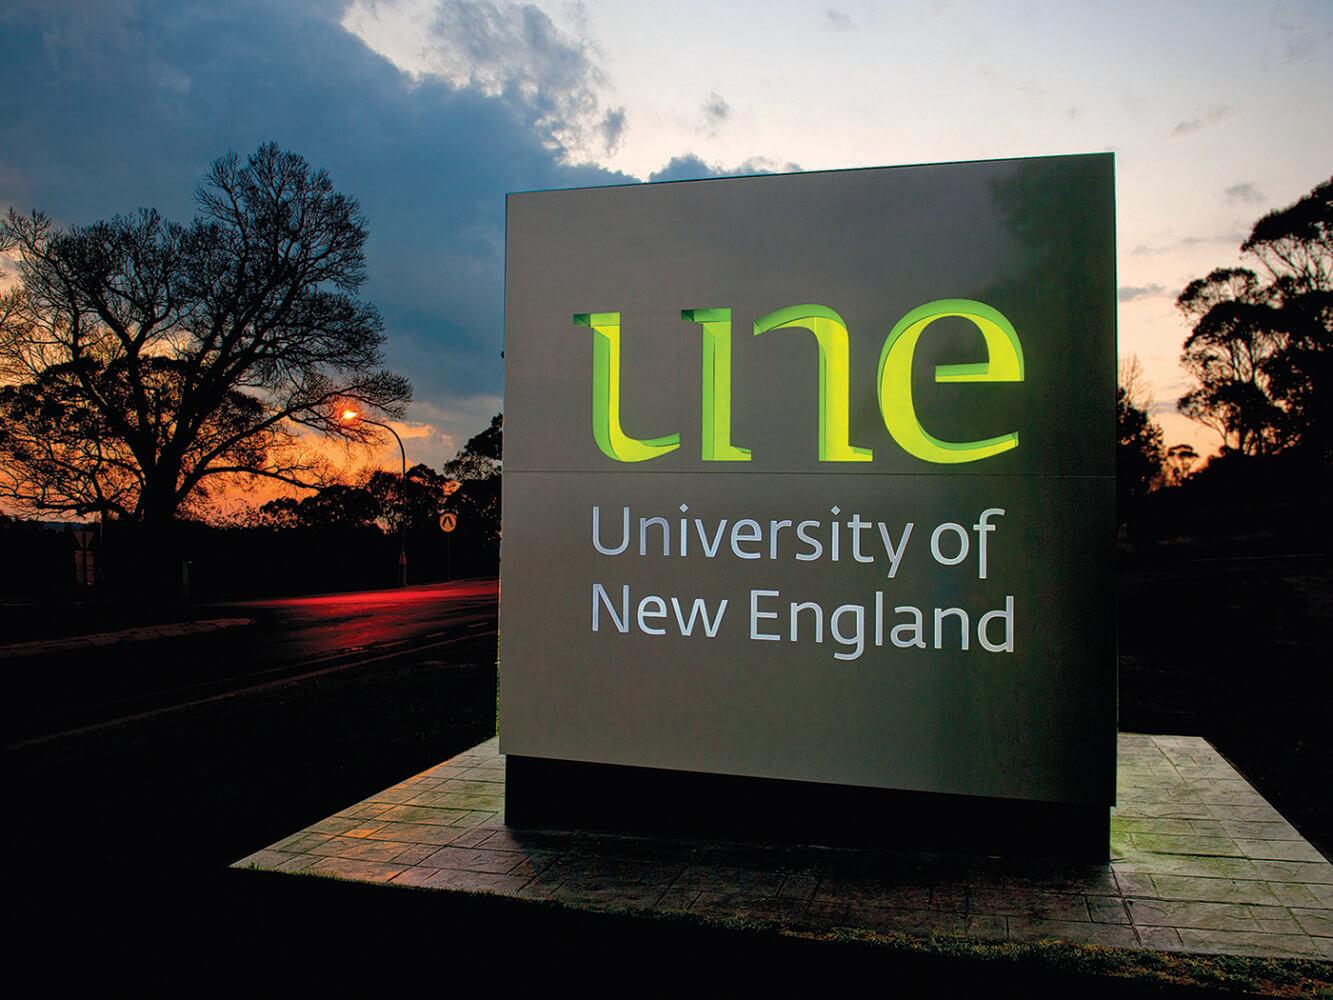 The University of New England – Universities Australia